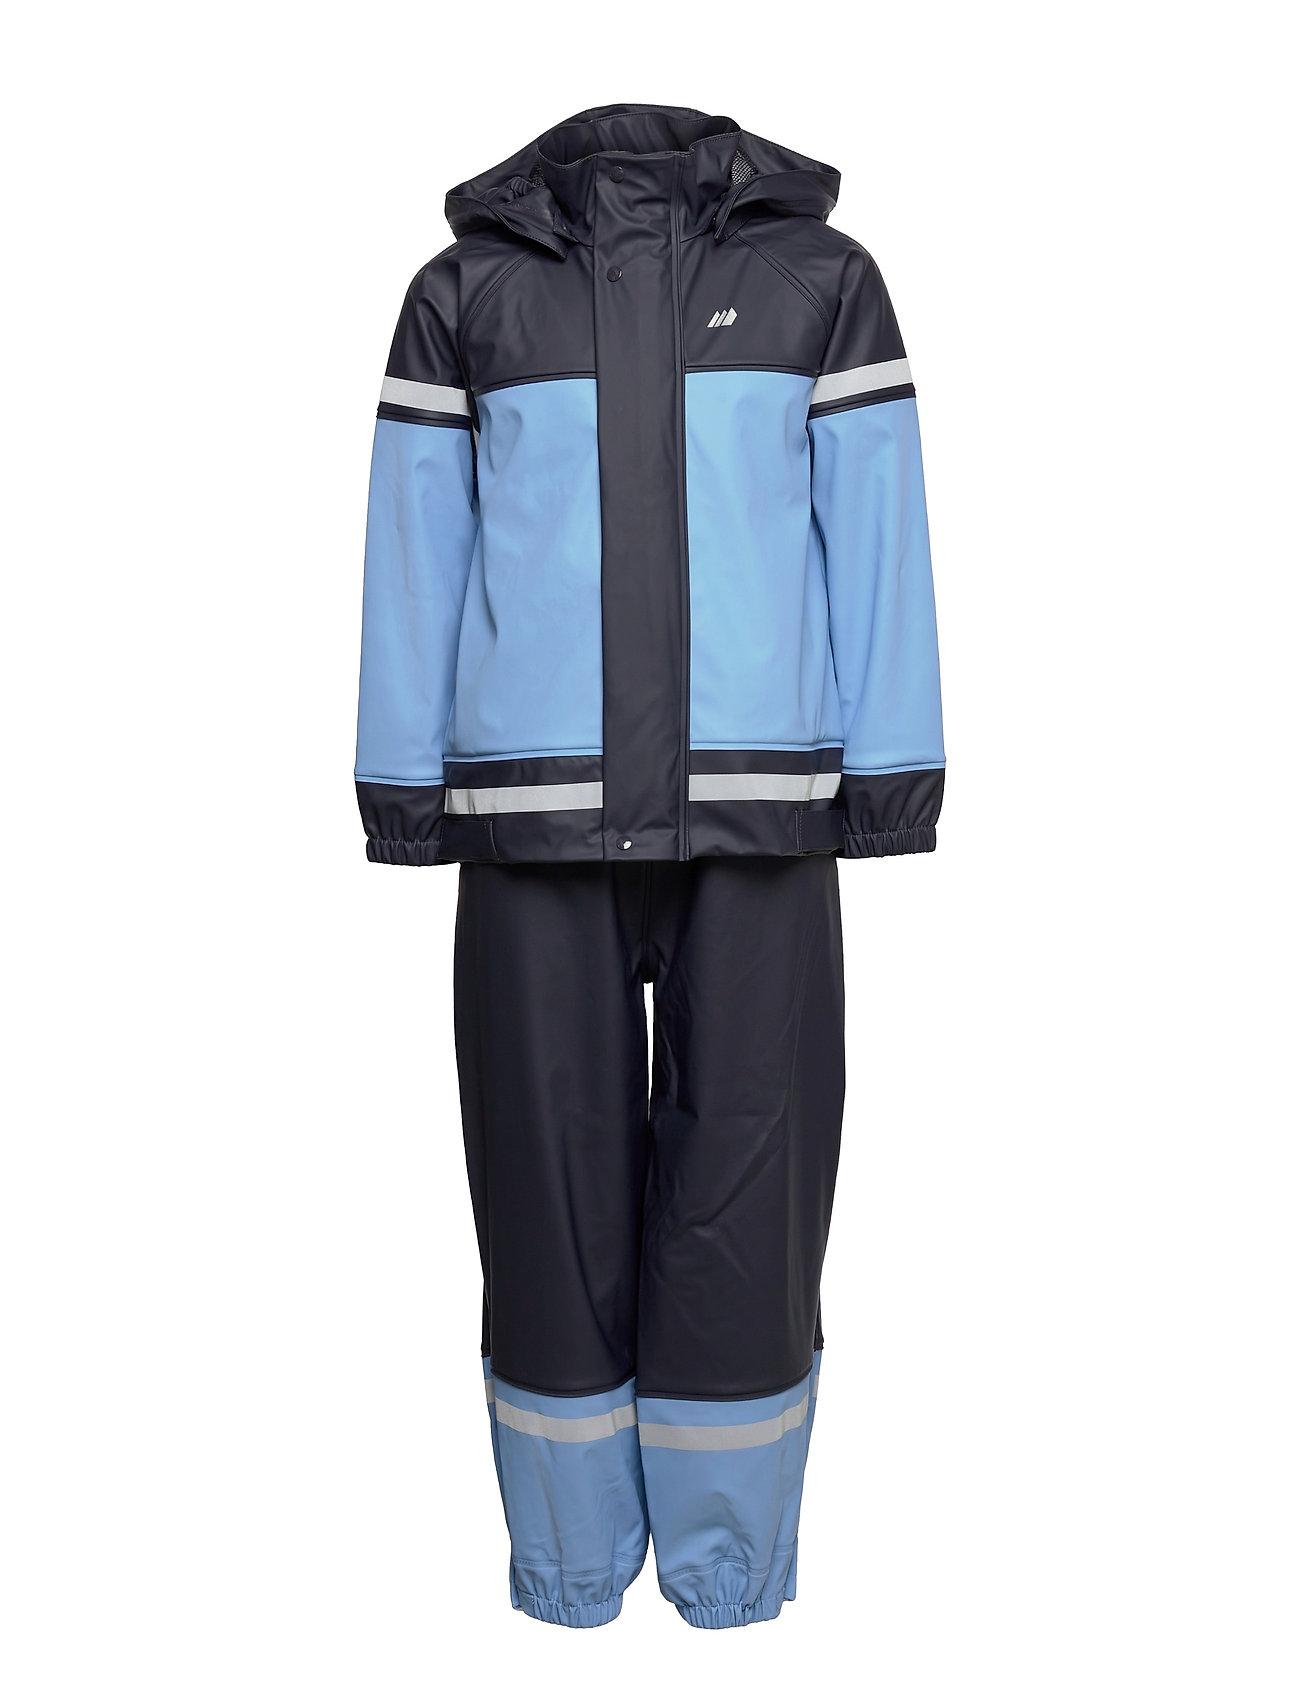 Ona Pu Rain Set Outerwear Rainwear Sets & Coveralls Blå Skogstad